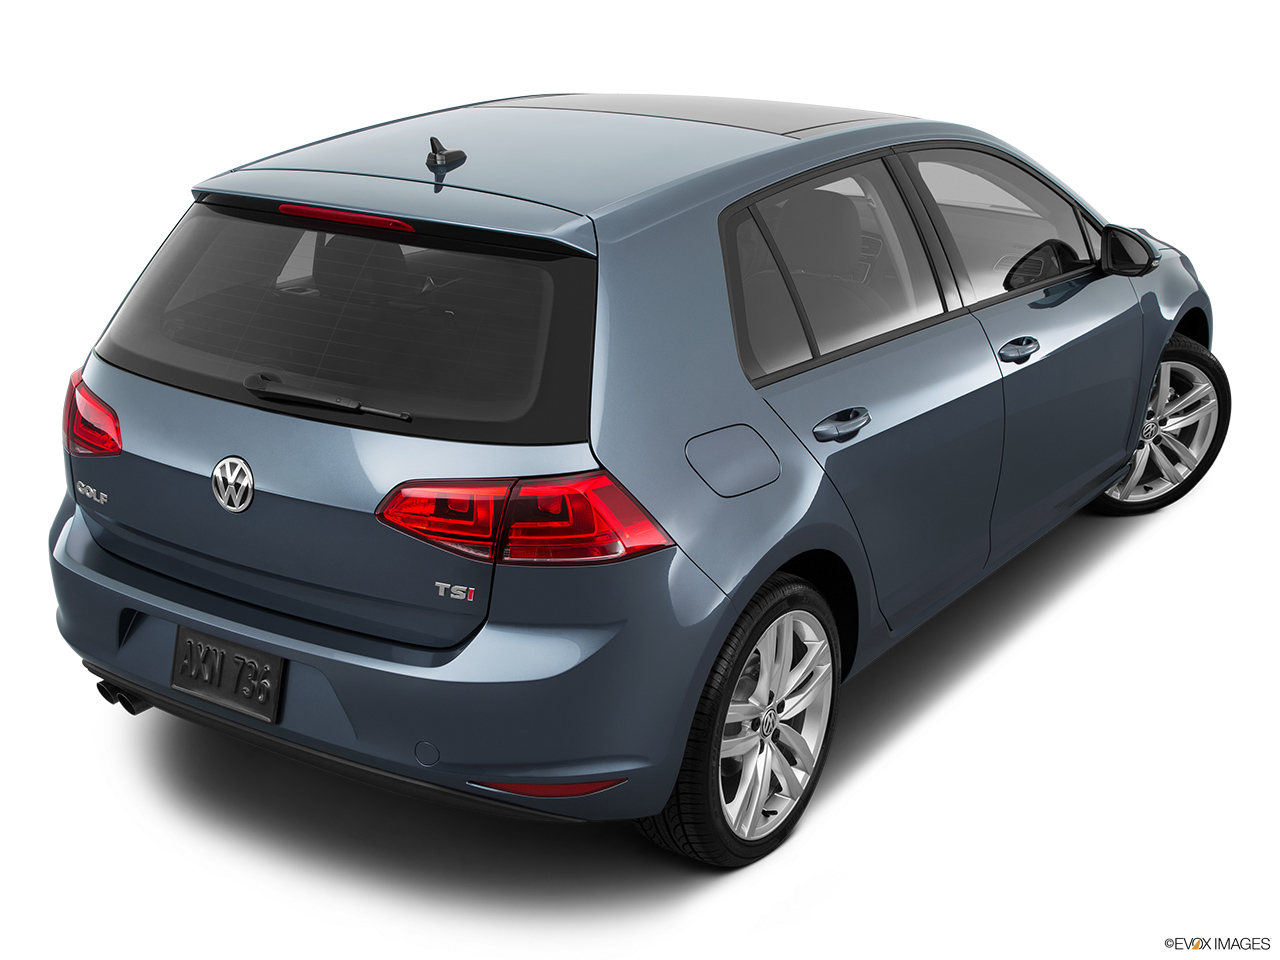 2015 volkswagen golf manual tdi sel hatchback front angle view rh carnow com Volkswagen Golf GTI VR6 1997 vw golf manual transmission